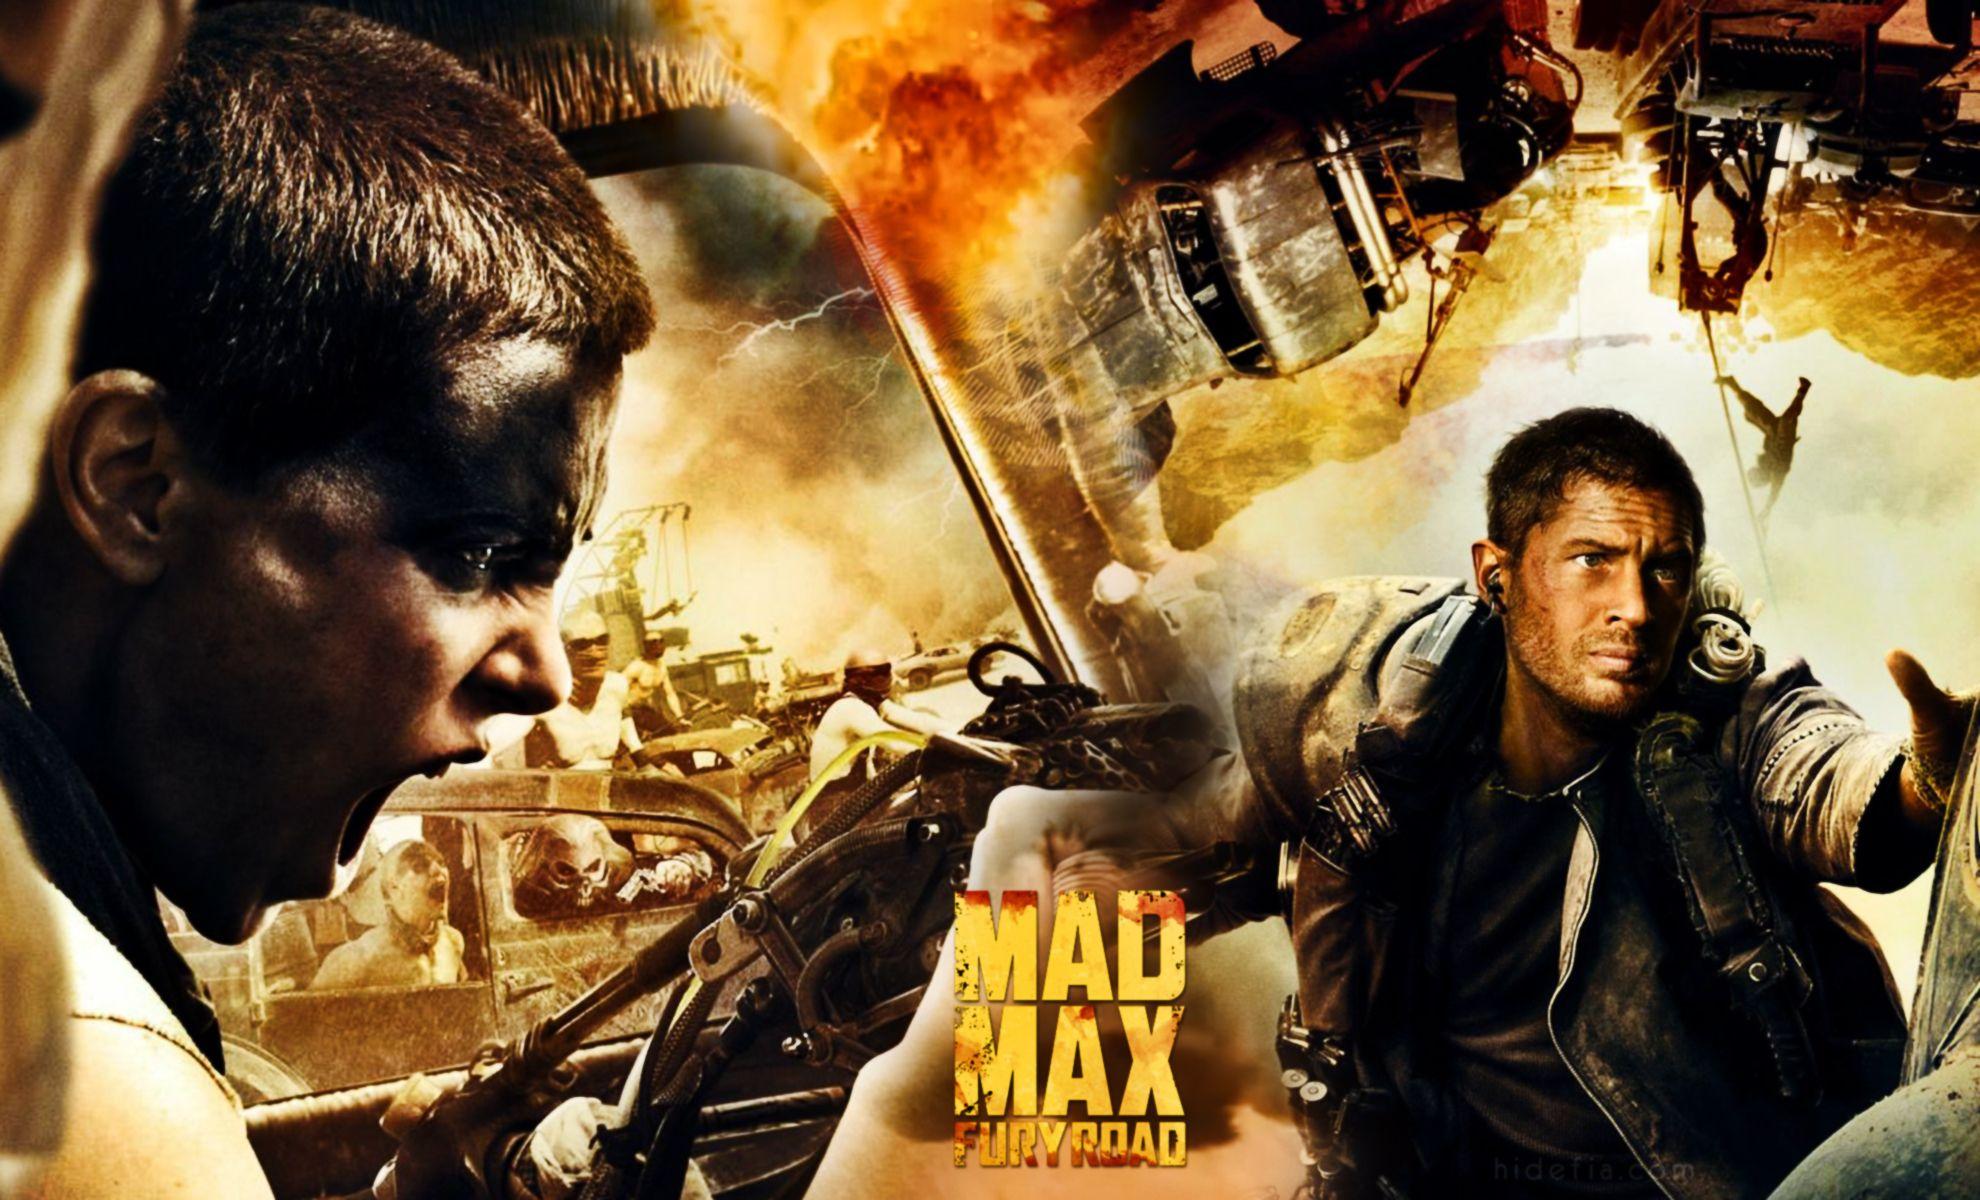 mad max full movie hd